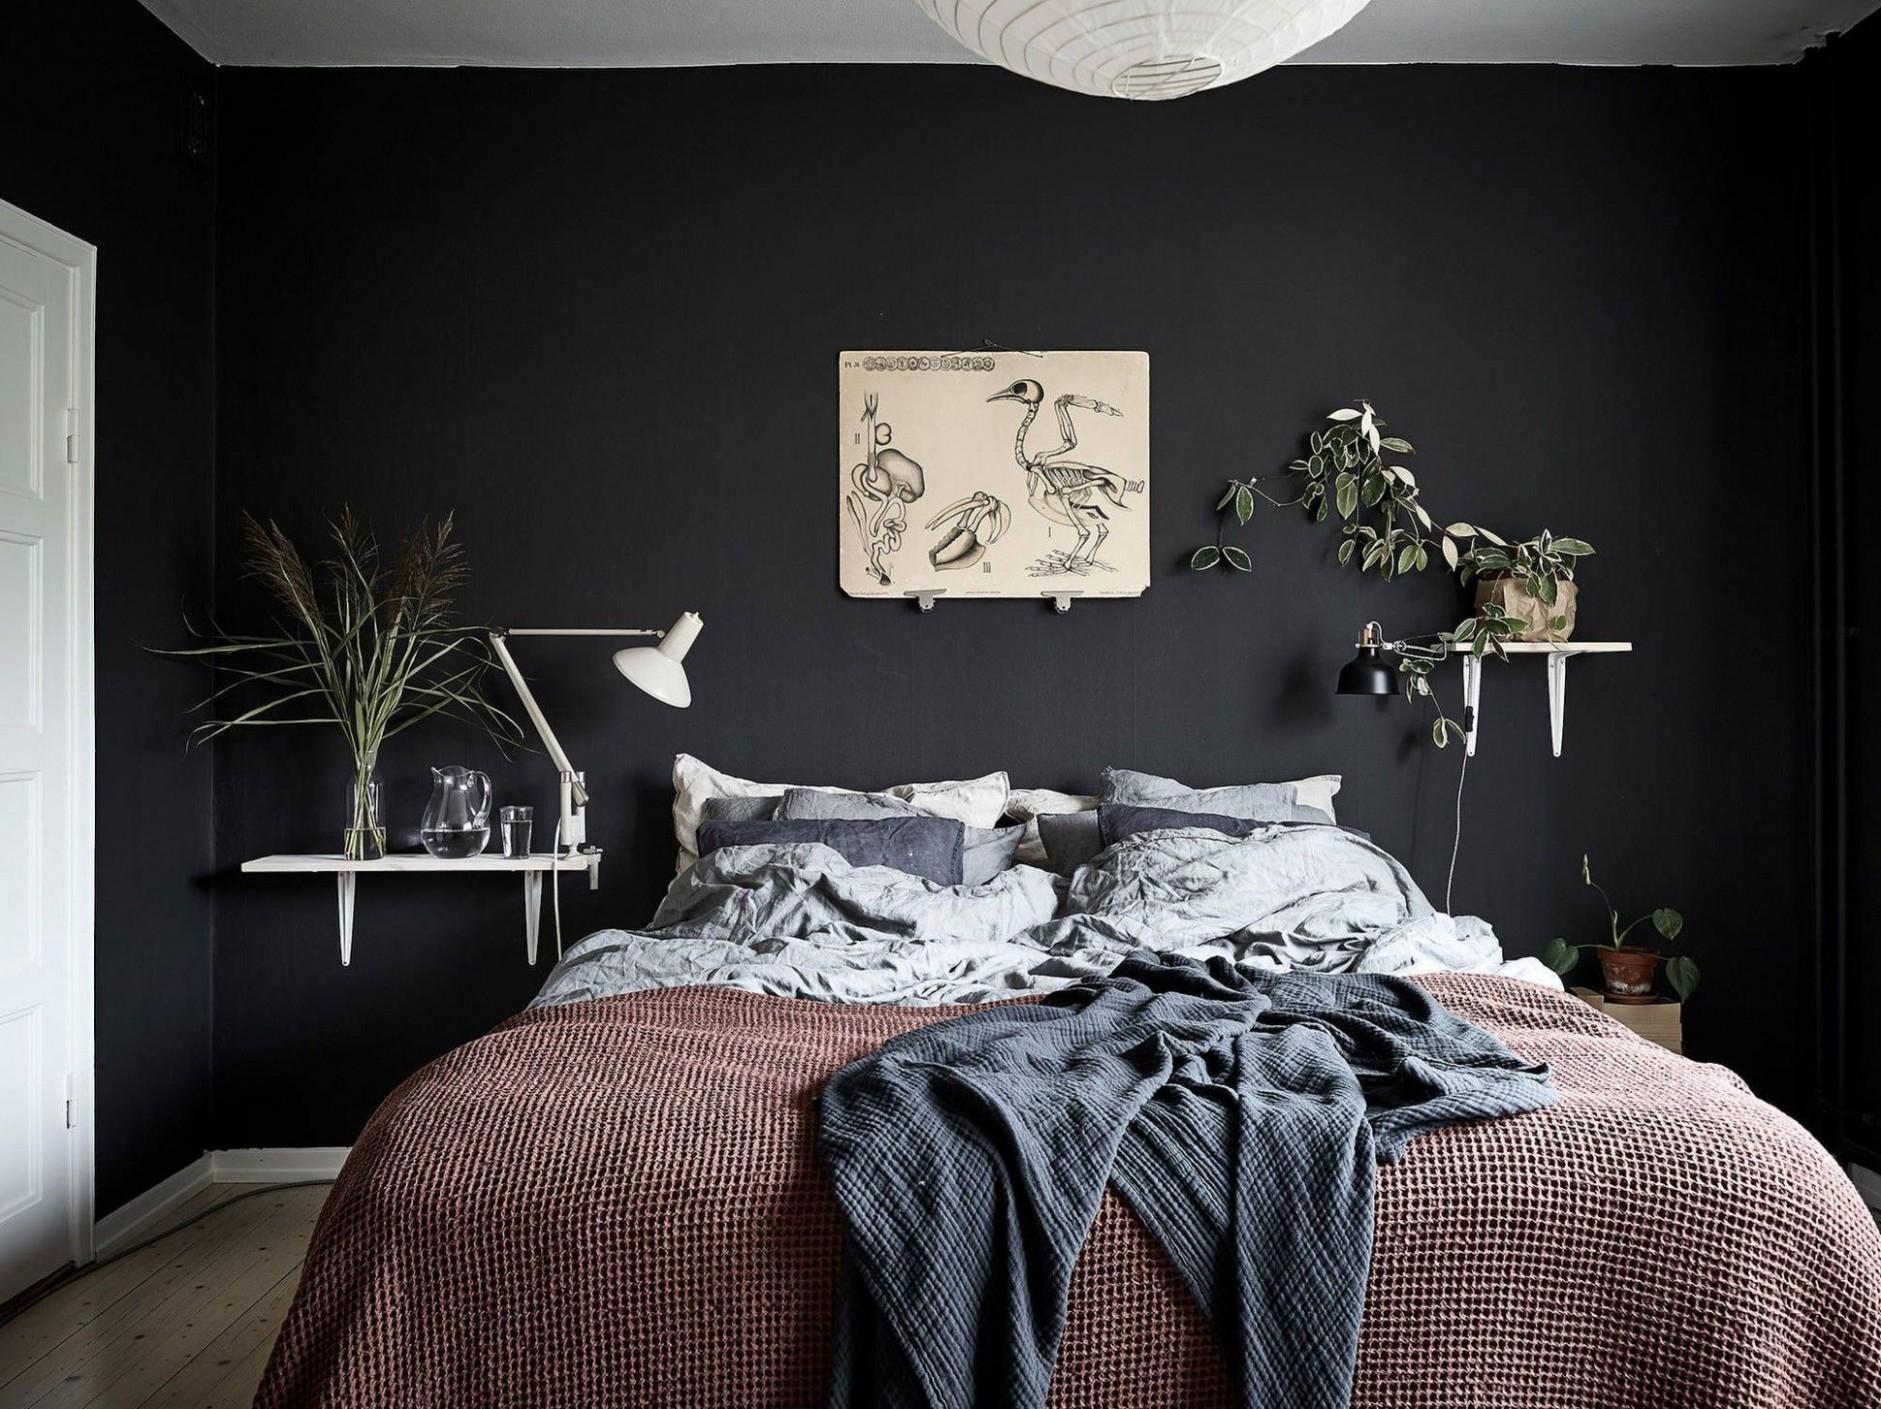 Unique Bedroom Ideas Nz#sovruminspiration #sovruminspirationblue  - Bedroom Ideas Nz